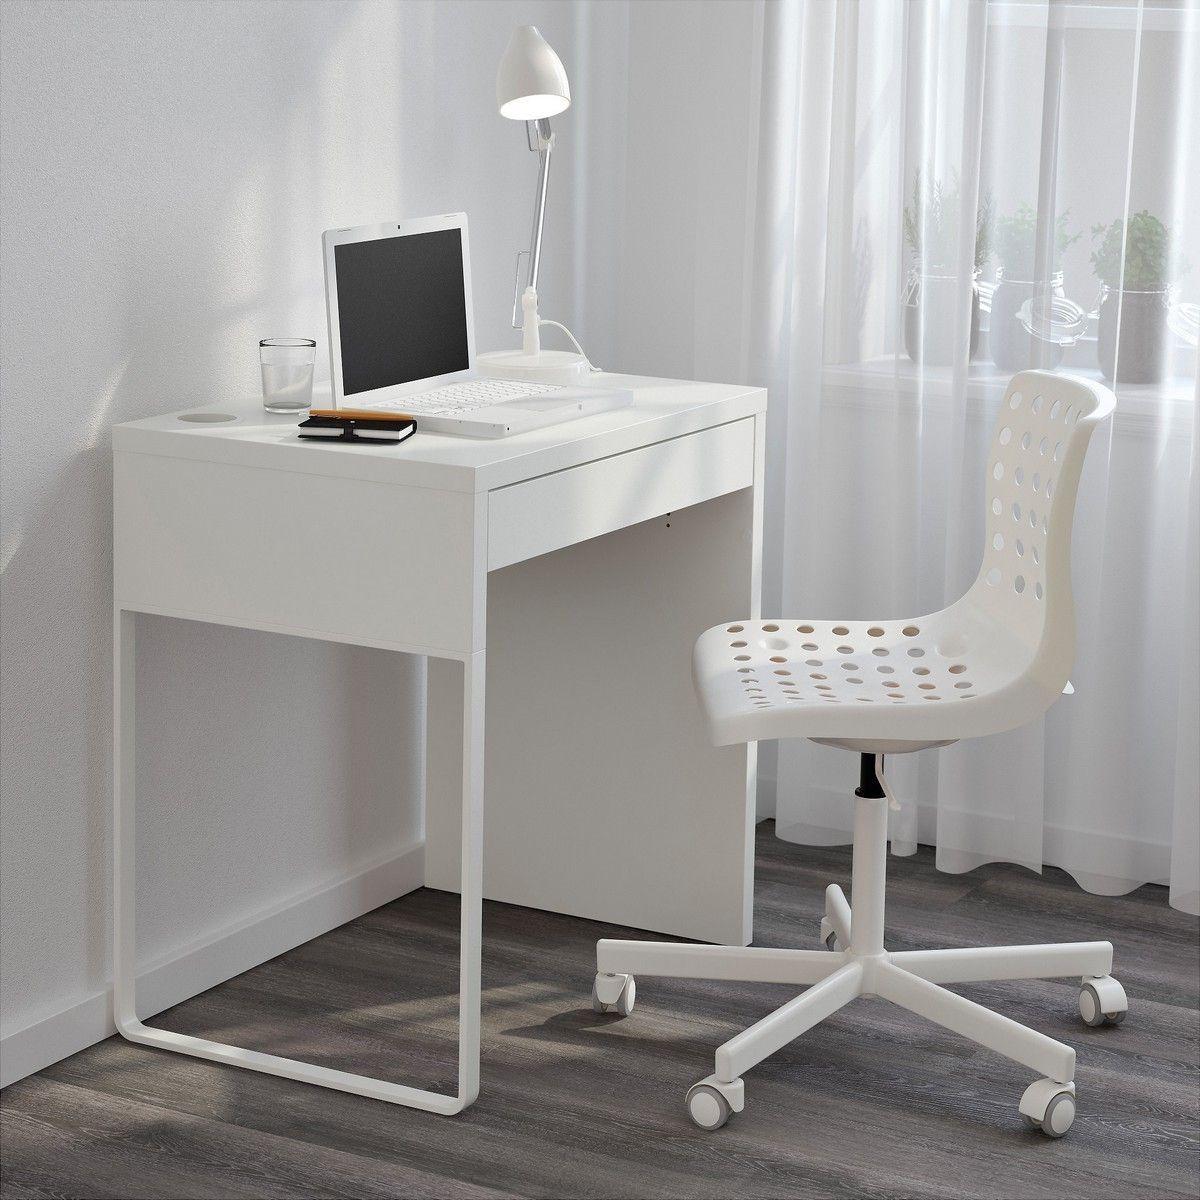 Desk Ideas Perfect For Small Spaces White Desk Bedroom Ikea